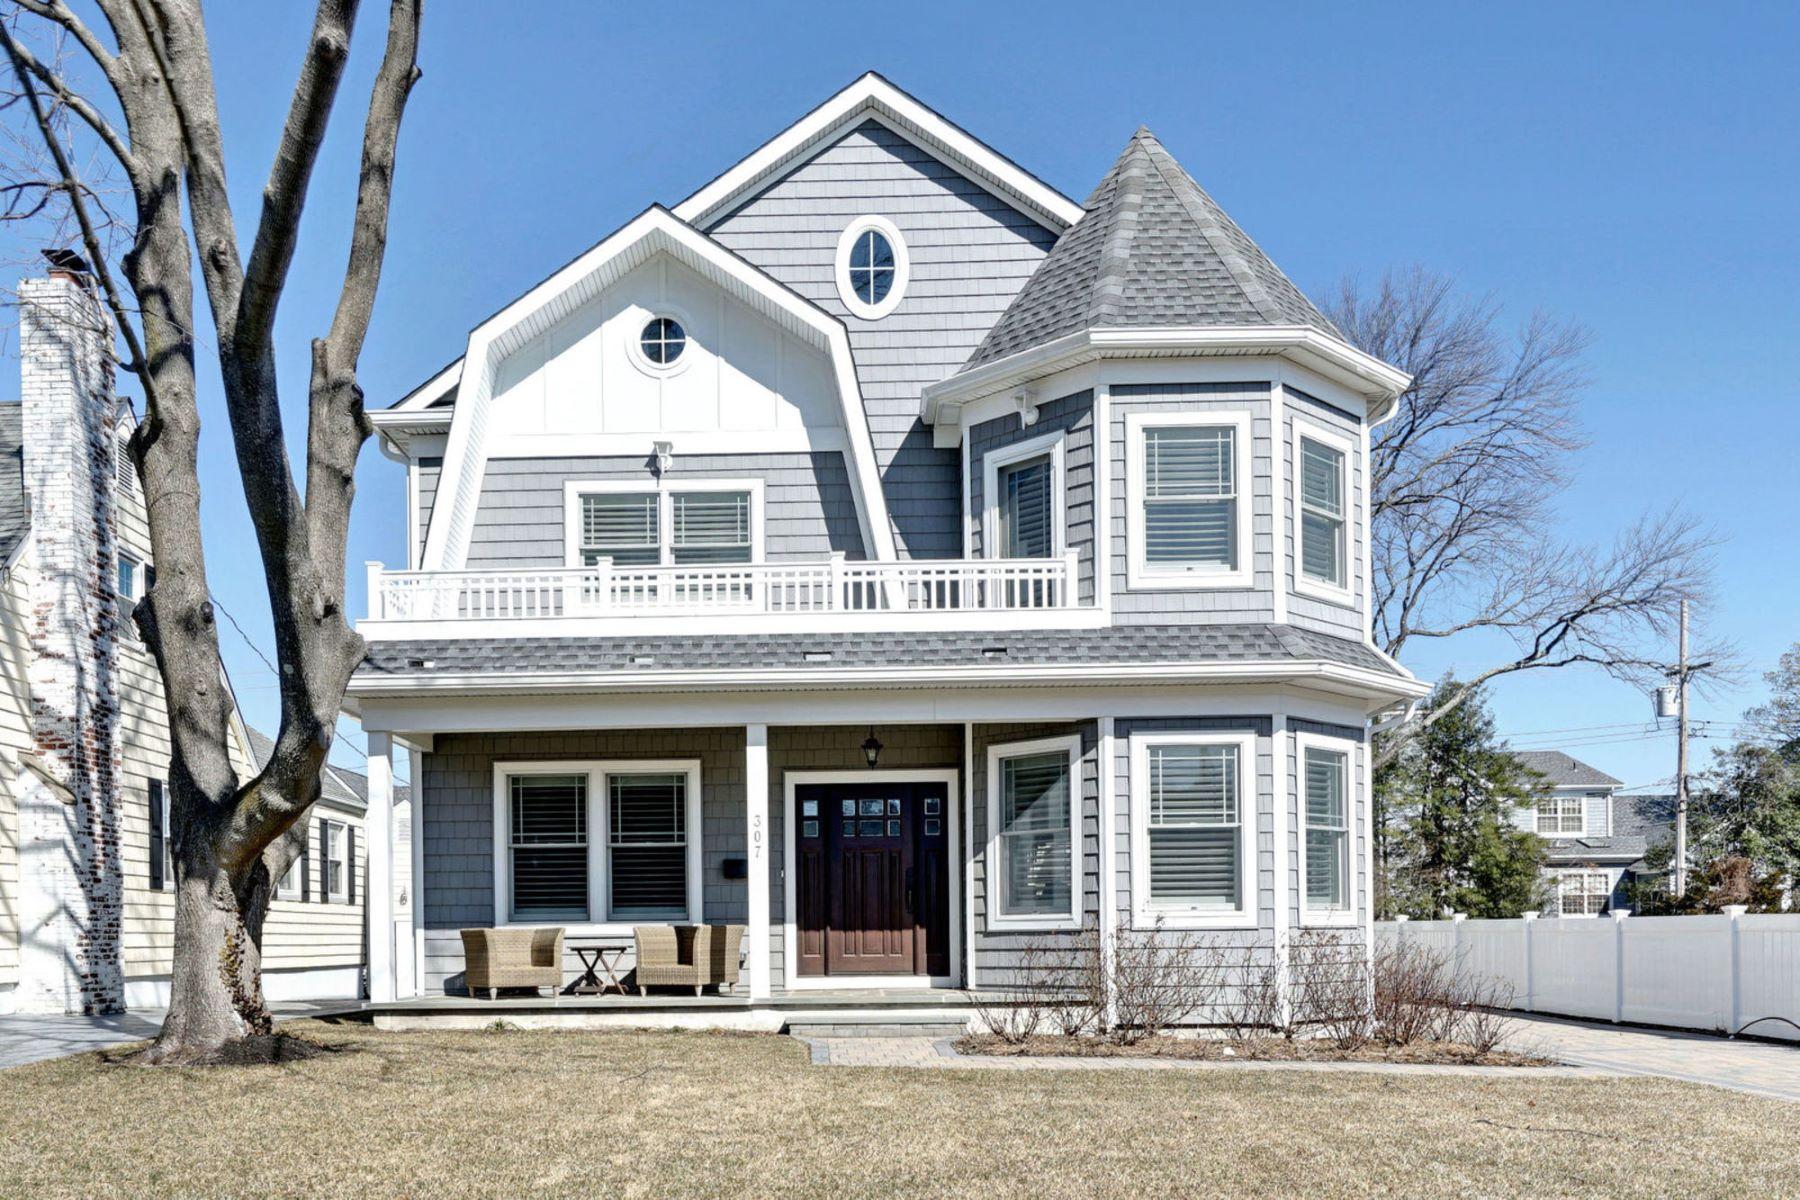 Single Family Homes for Sale at Elegant Coastal Living 307 Stockton Boulevard Sea Girt, New Jersey 08750 United States